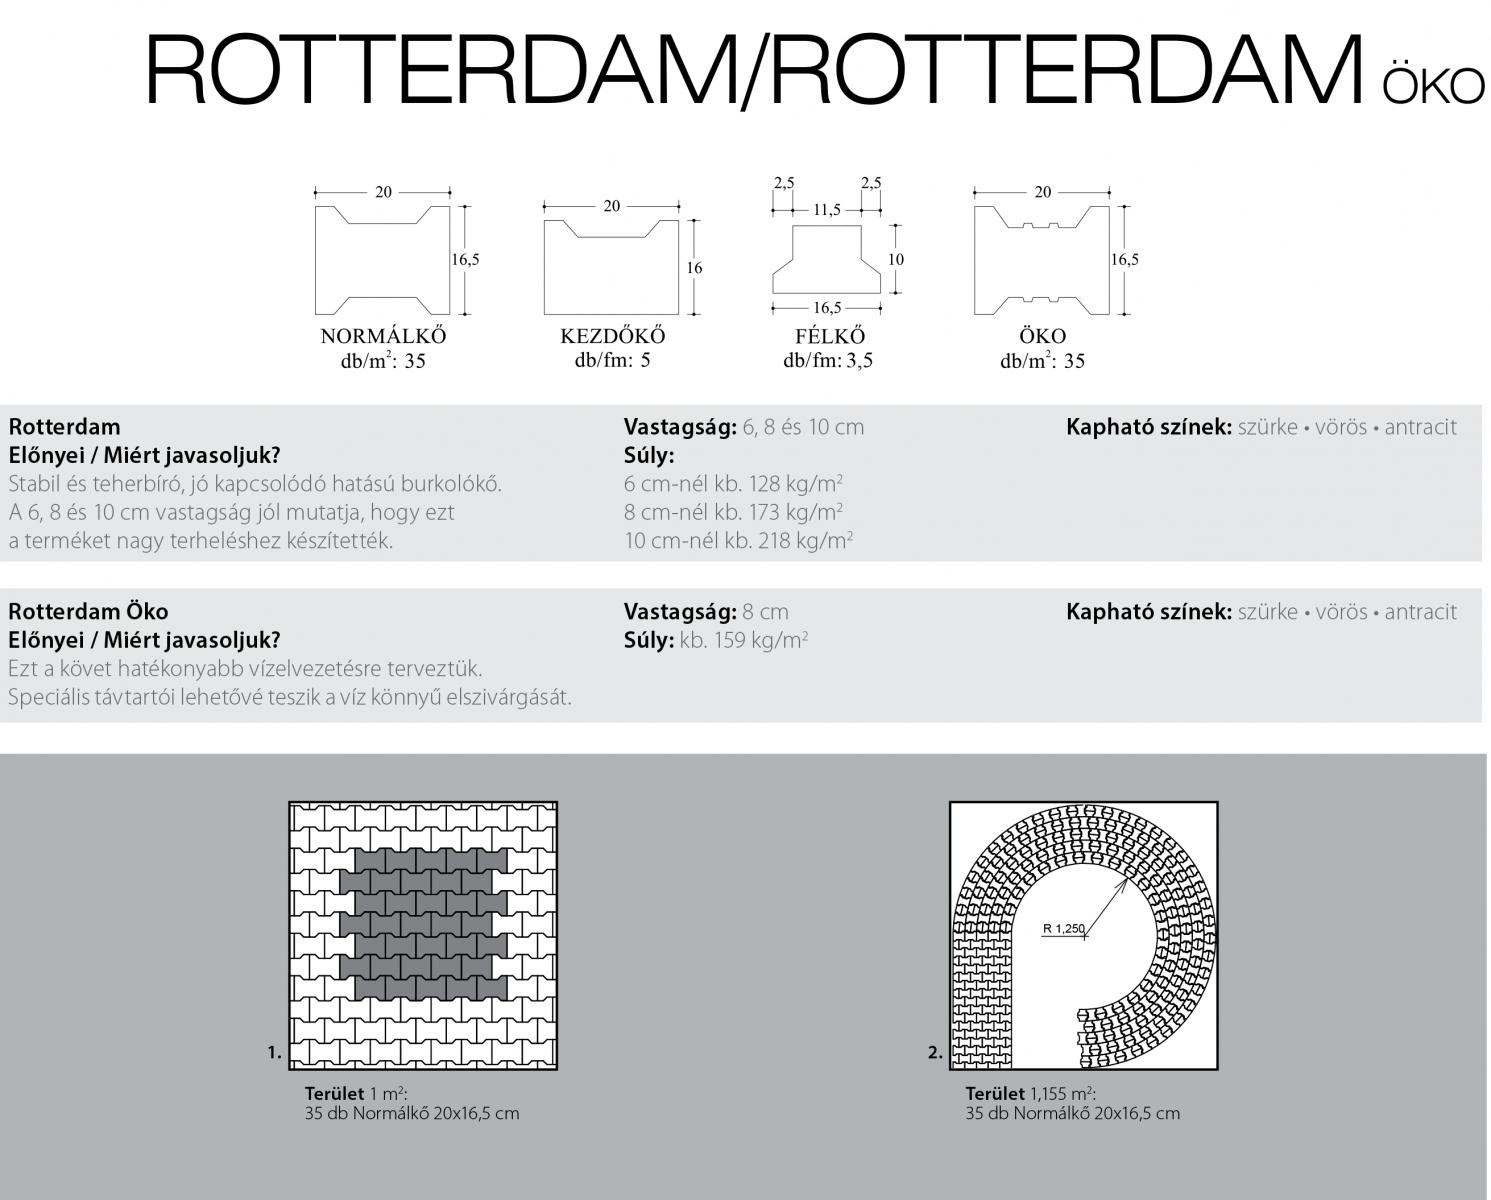 Rotterdam öko technikai információi